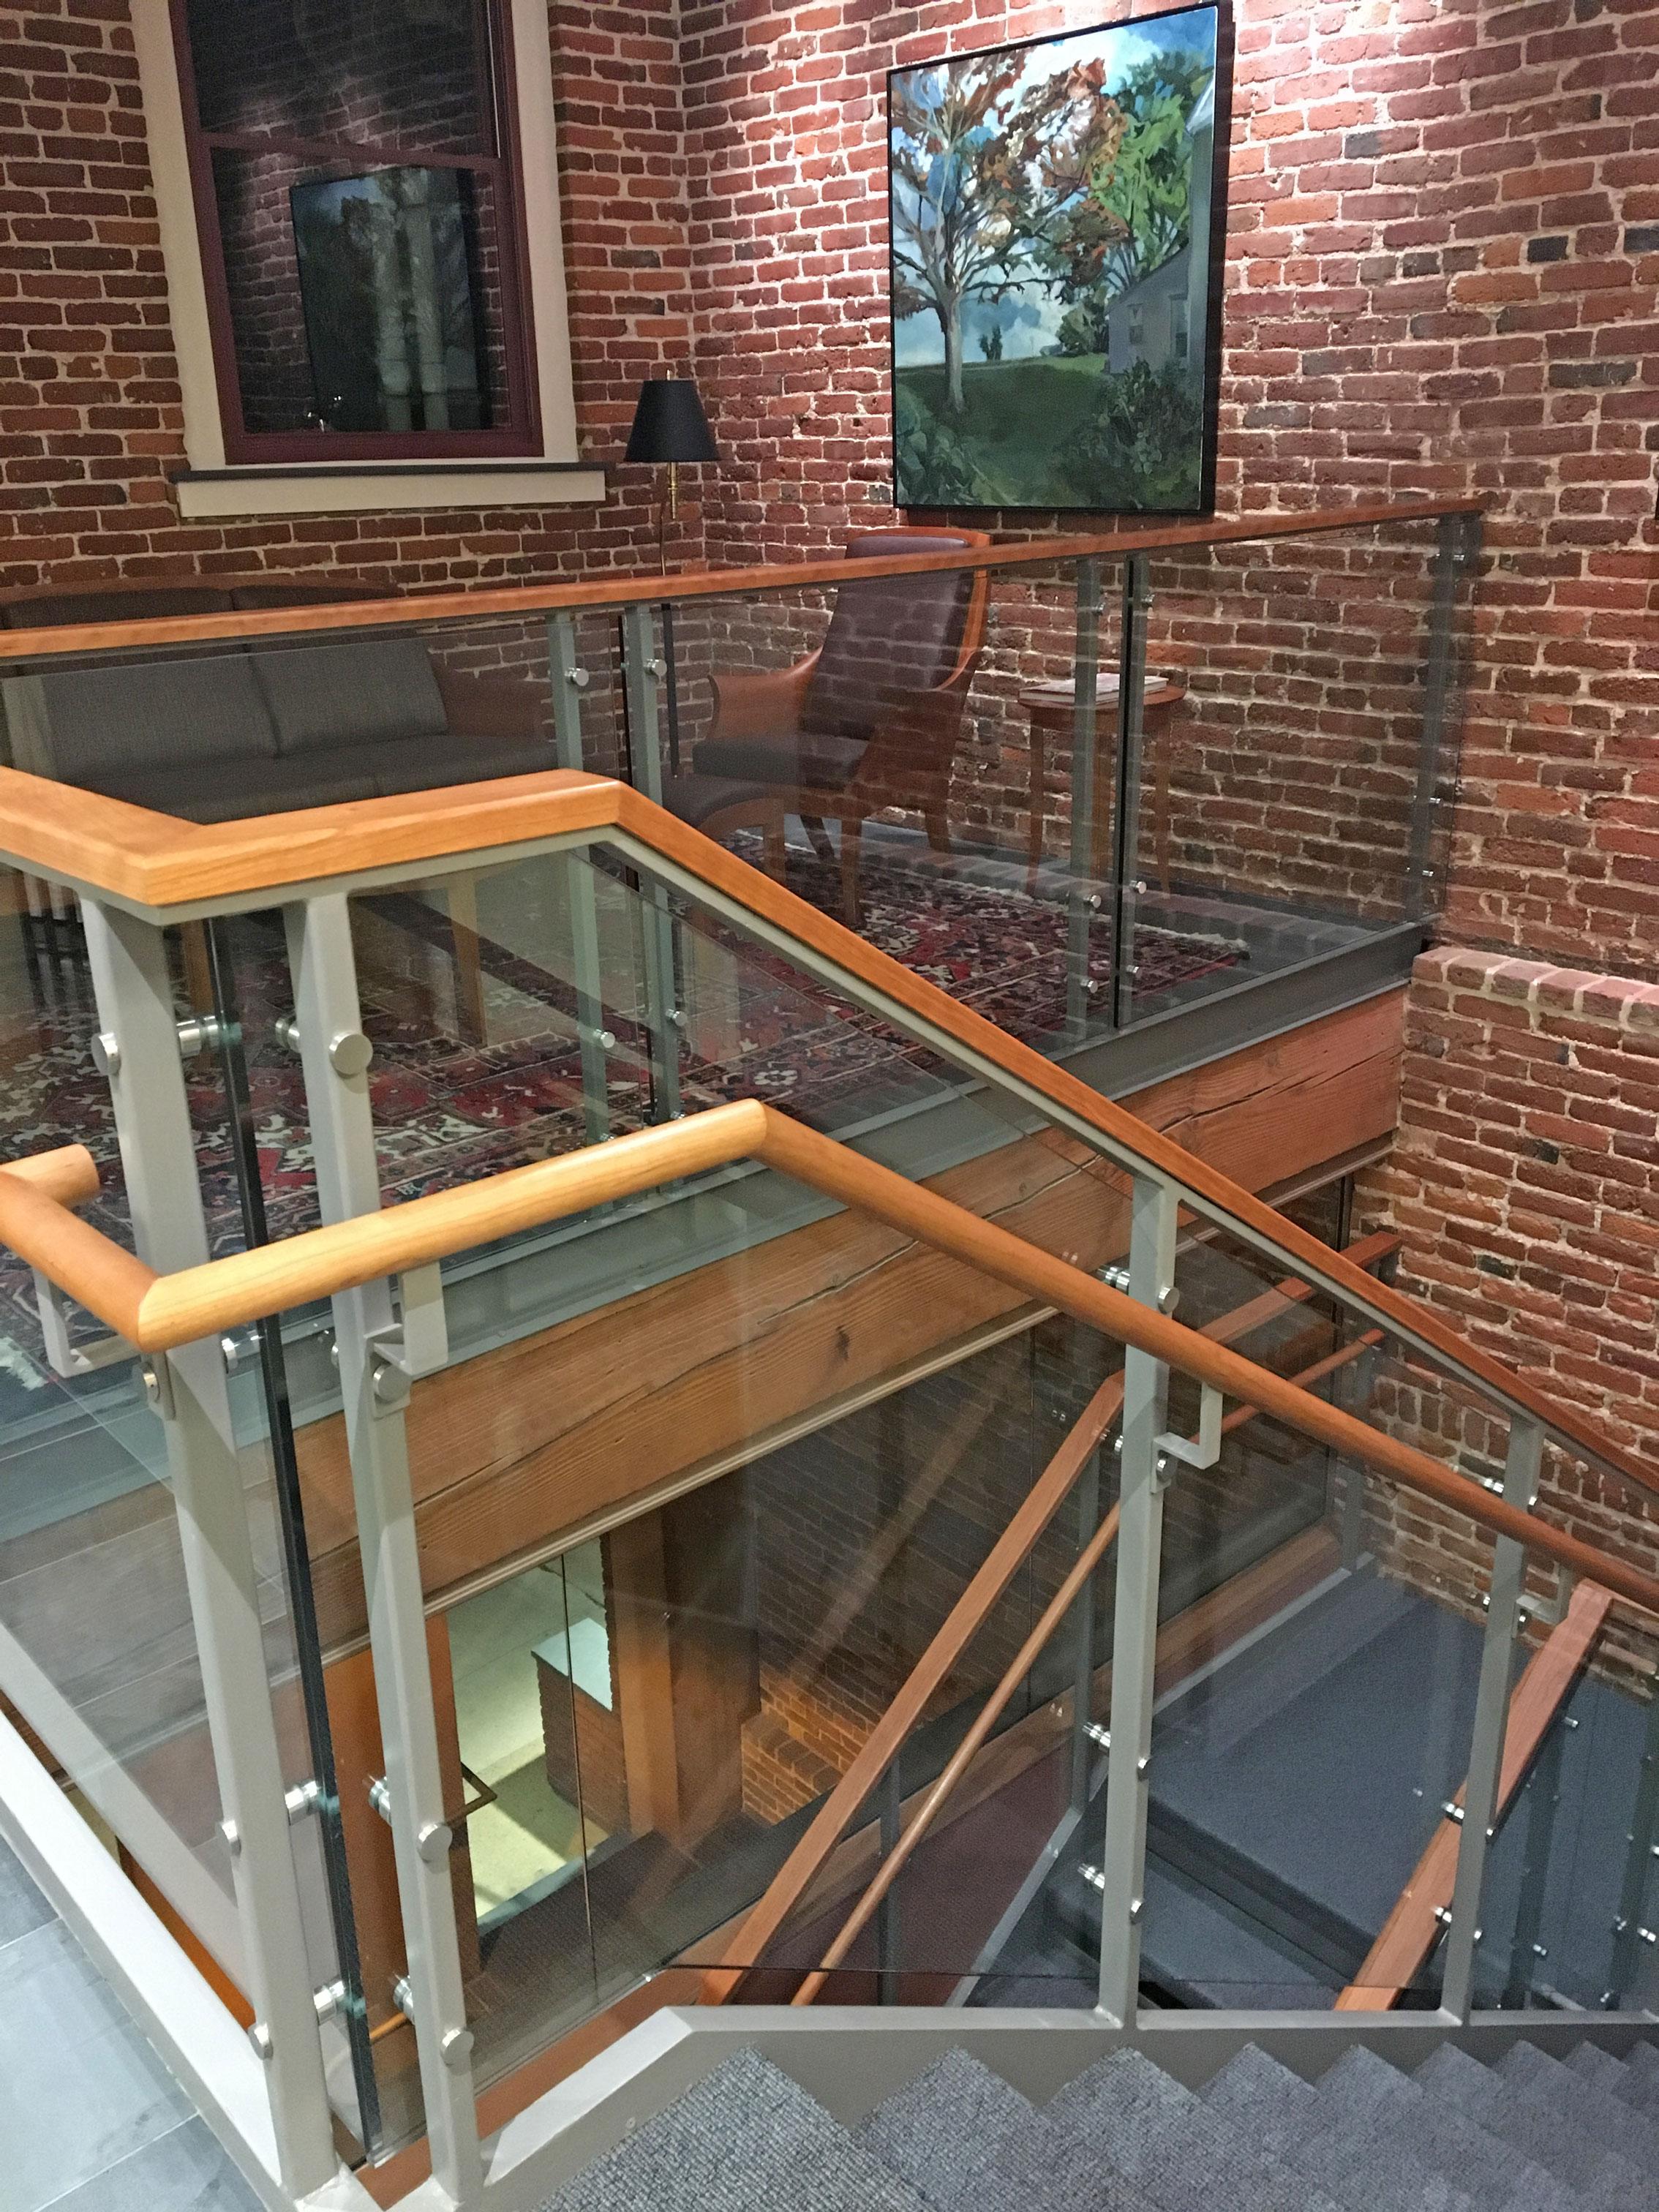 grg-building-interior-stairs.jpg